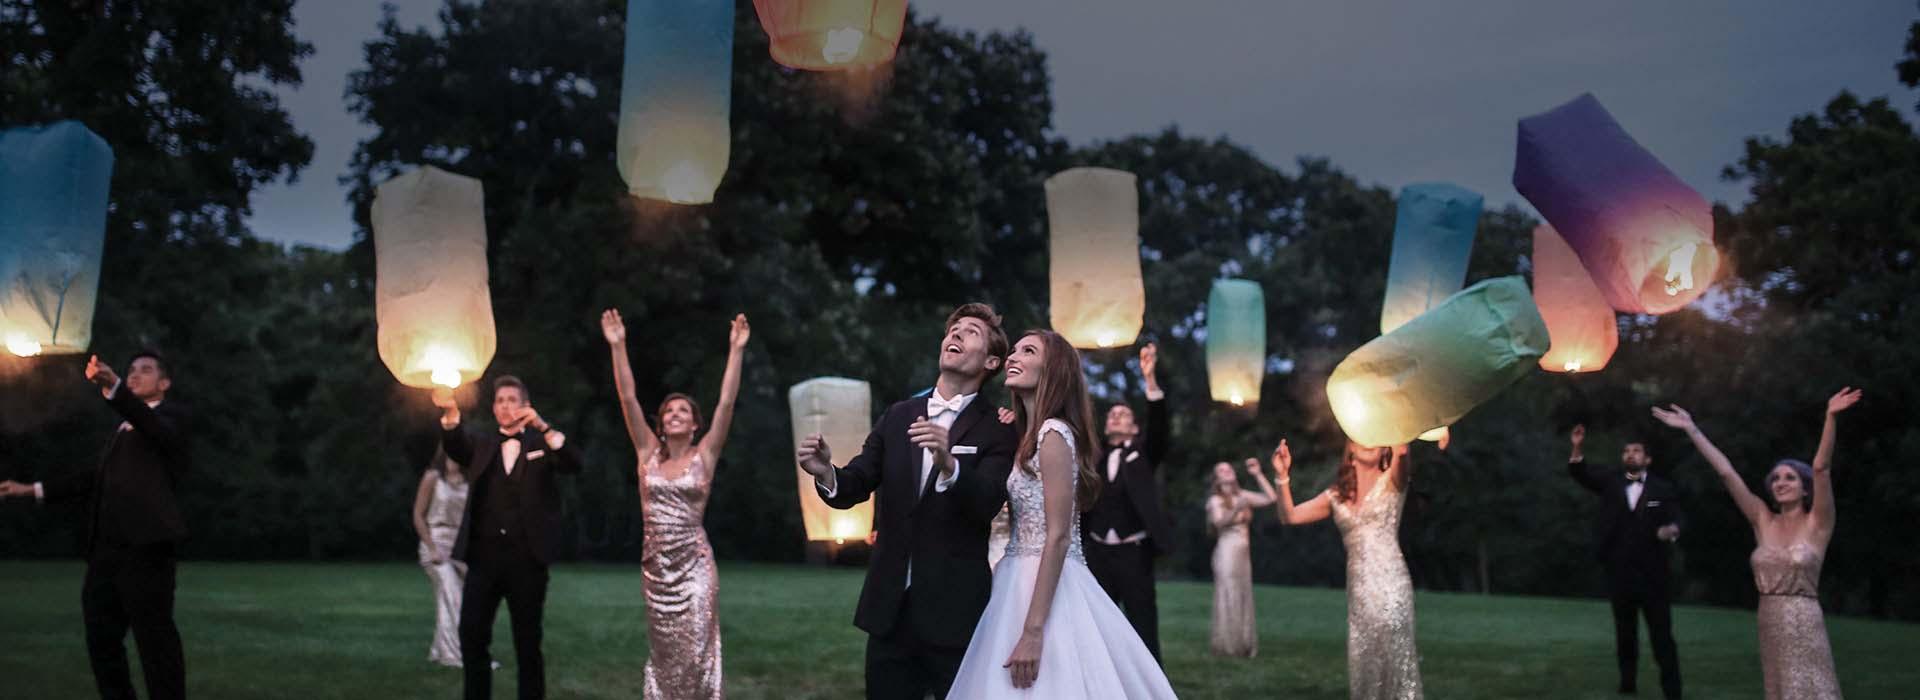 Wedding Savings Image 2